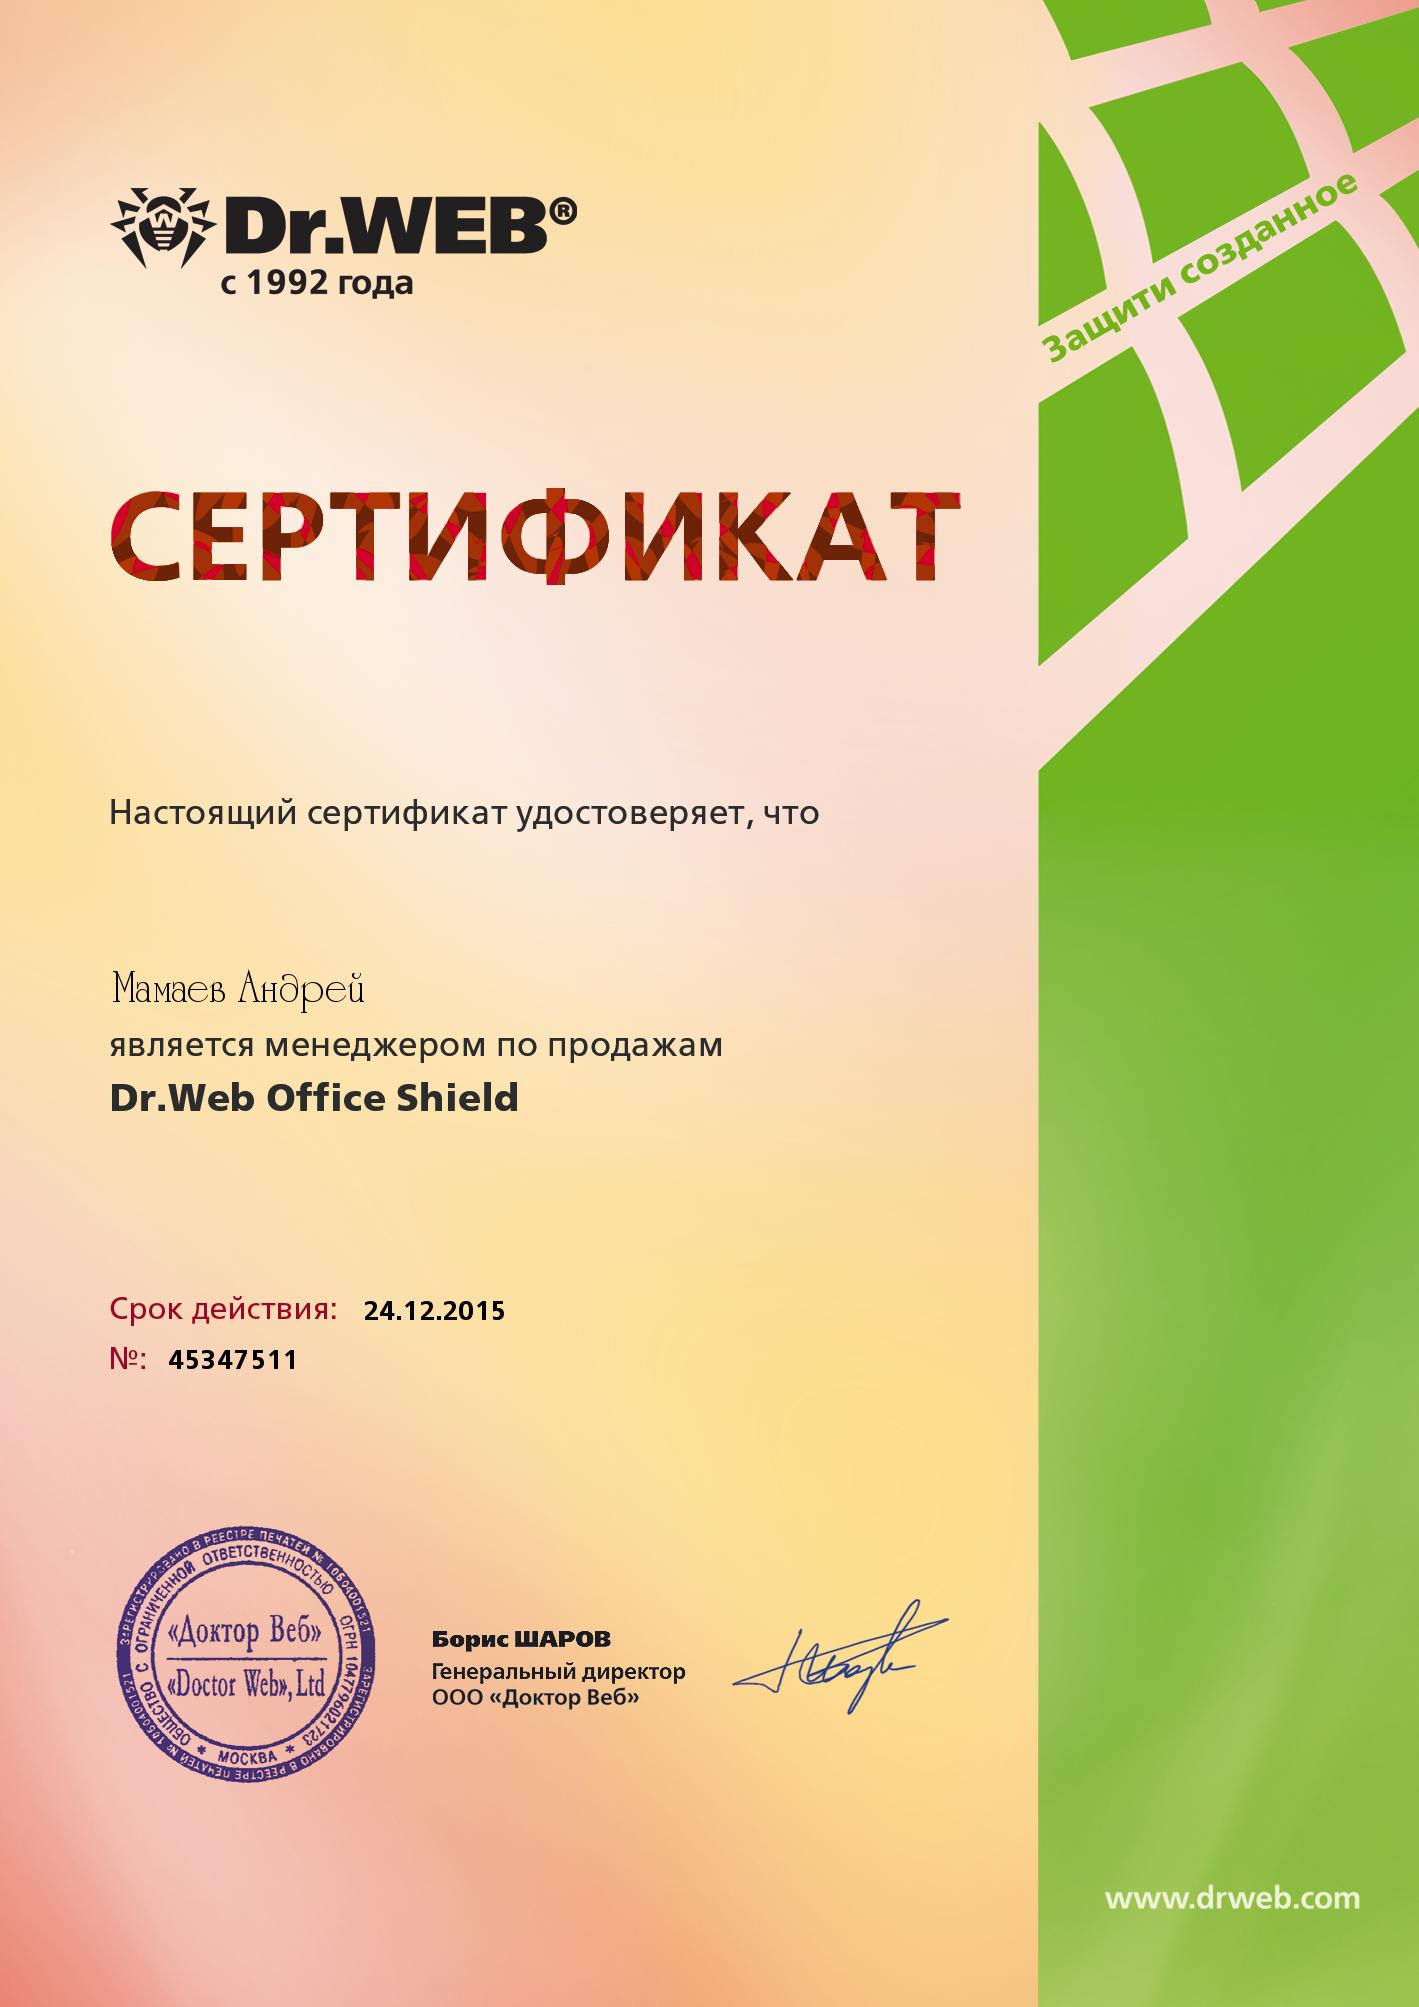 (DWCERT-010-1) Сертифицированный менеджер по продажам Dr.Web Office Shield (Мамаев) 24.12.2015